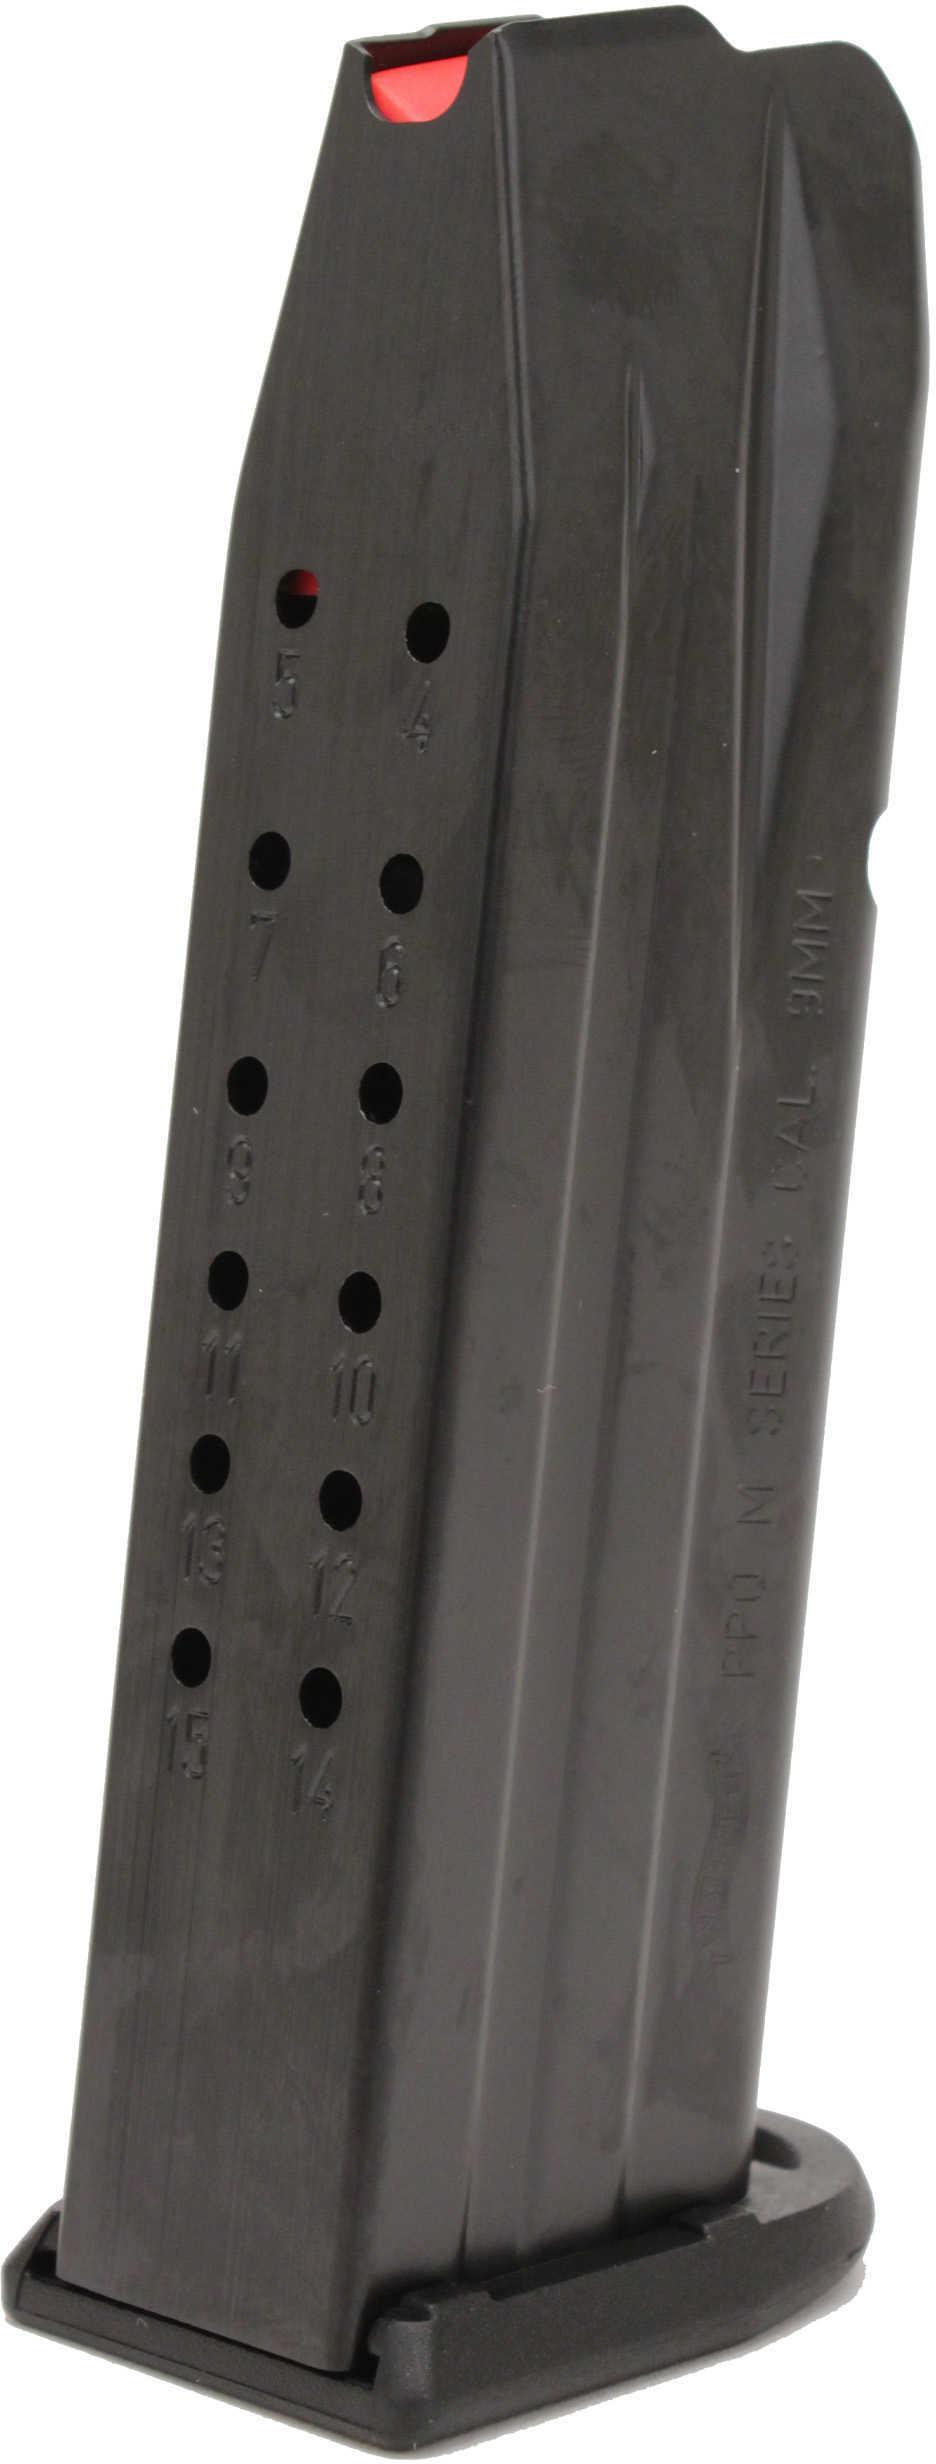 Walther PPQ M2 9mm Magazine 15 Round Md: 2796678